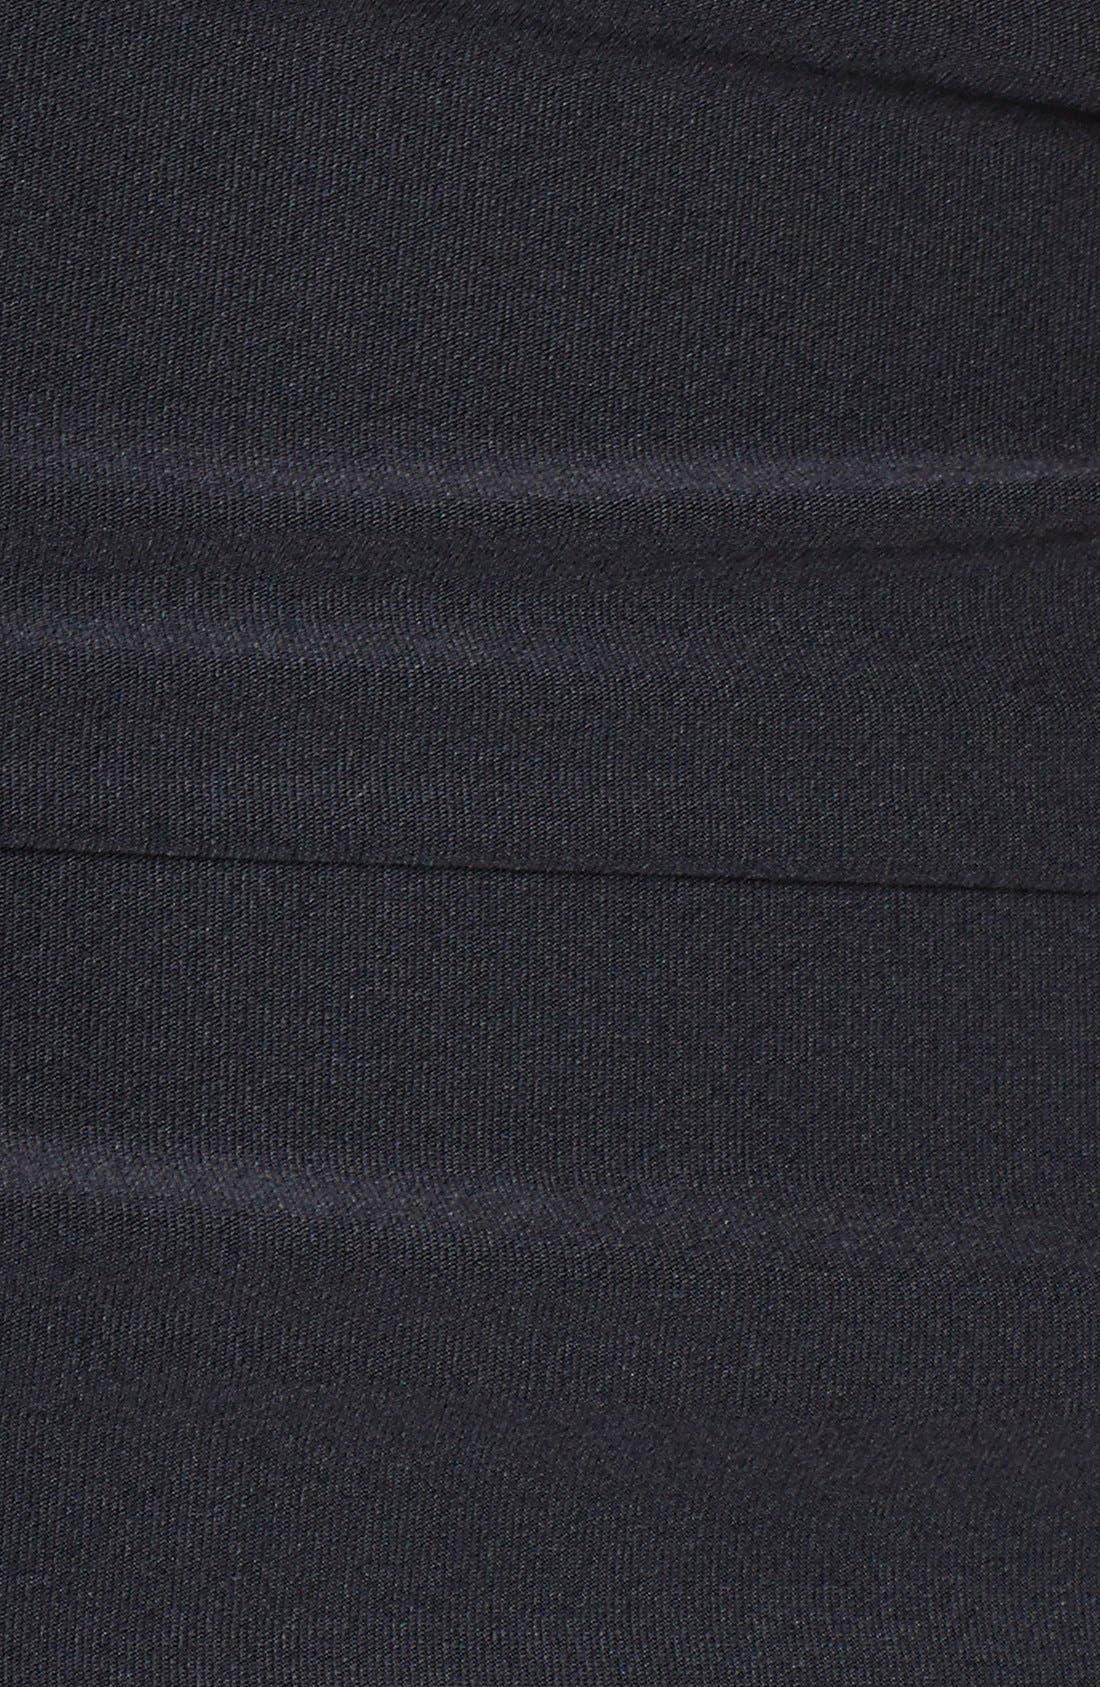 Badgley Mischka Dip Back Maillot Swimsuit, Main, color, 001